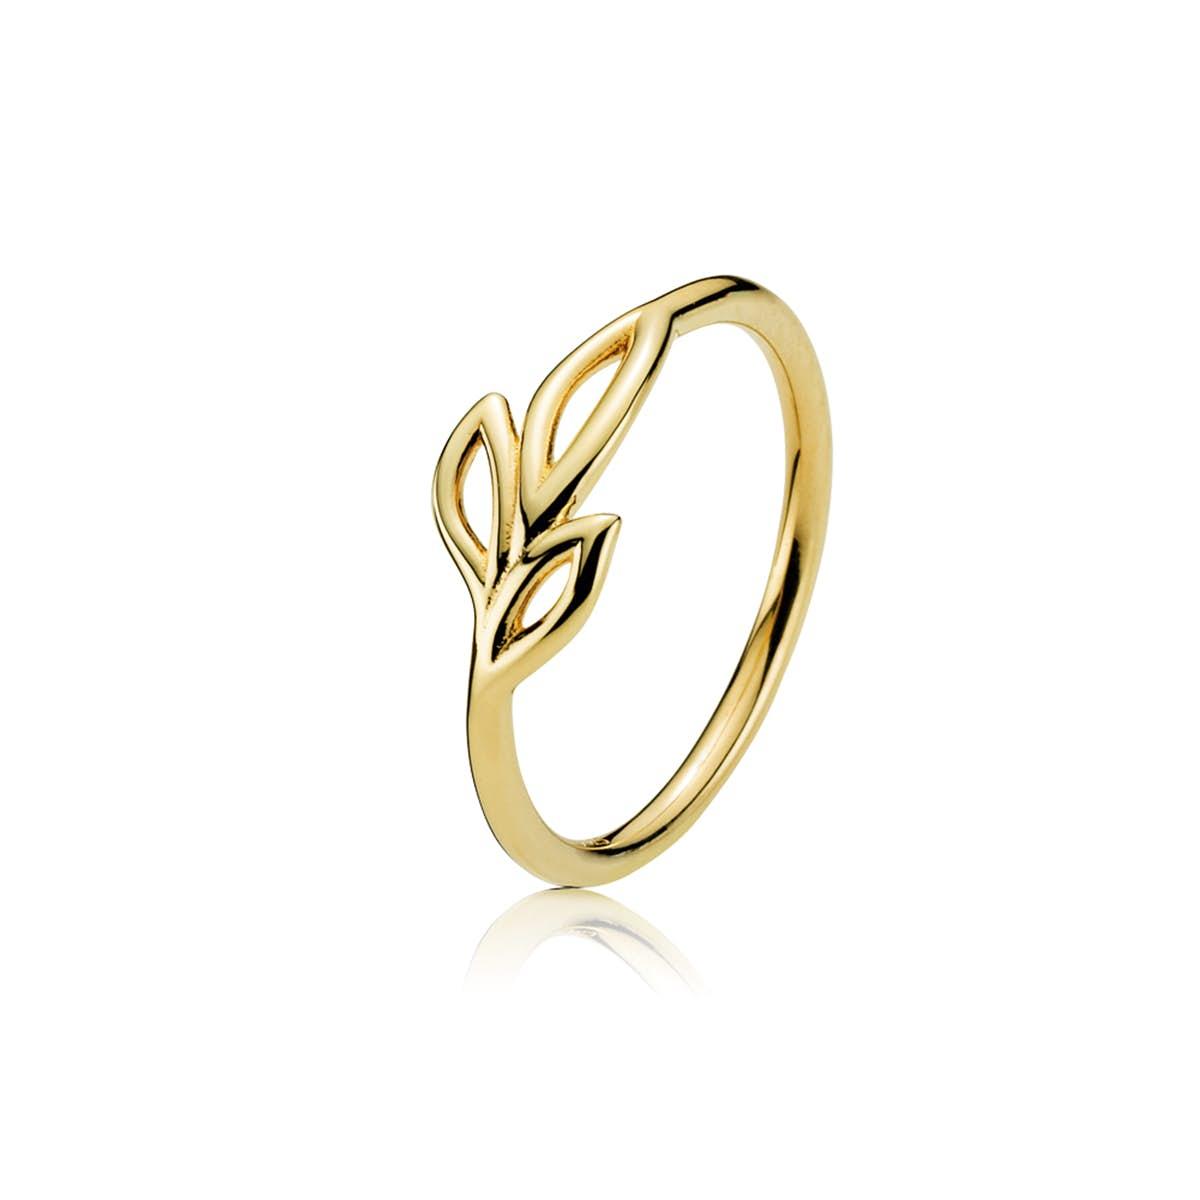 Dreamy Ring von Izabel Camille in Vergoldet-Silber Sterling 925